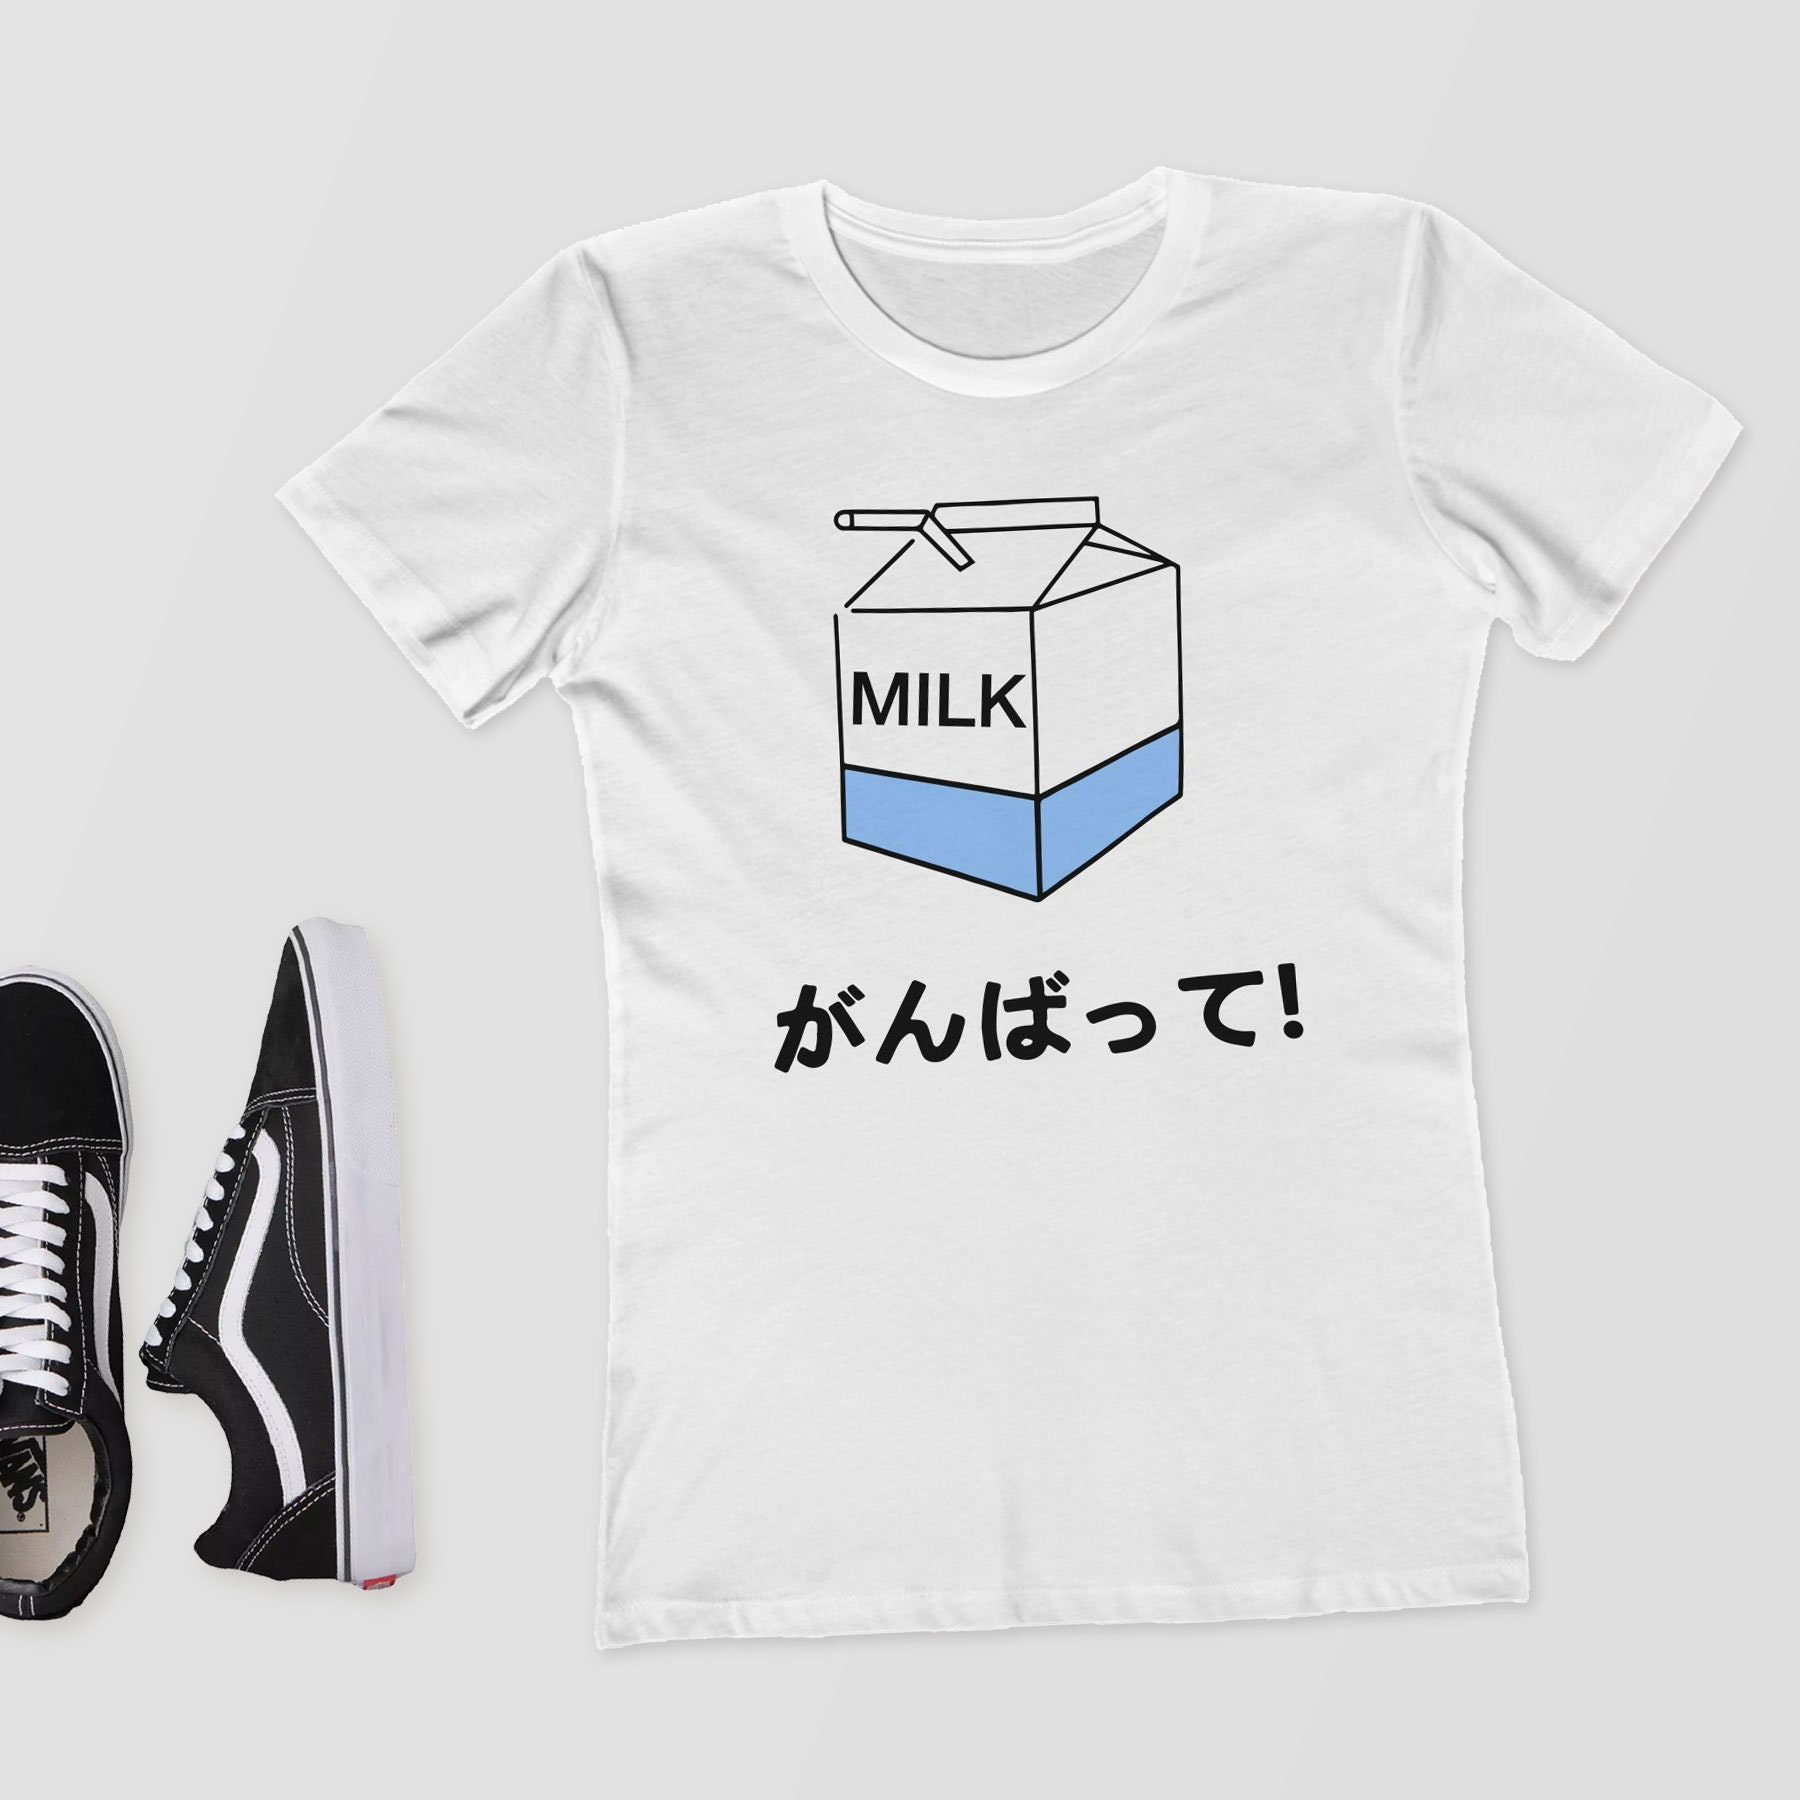 Bleach Anime T Shirts Uk - DREAMWORKS